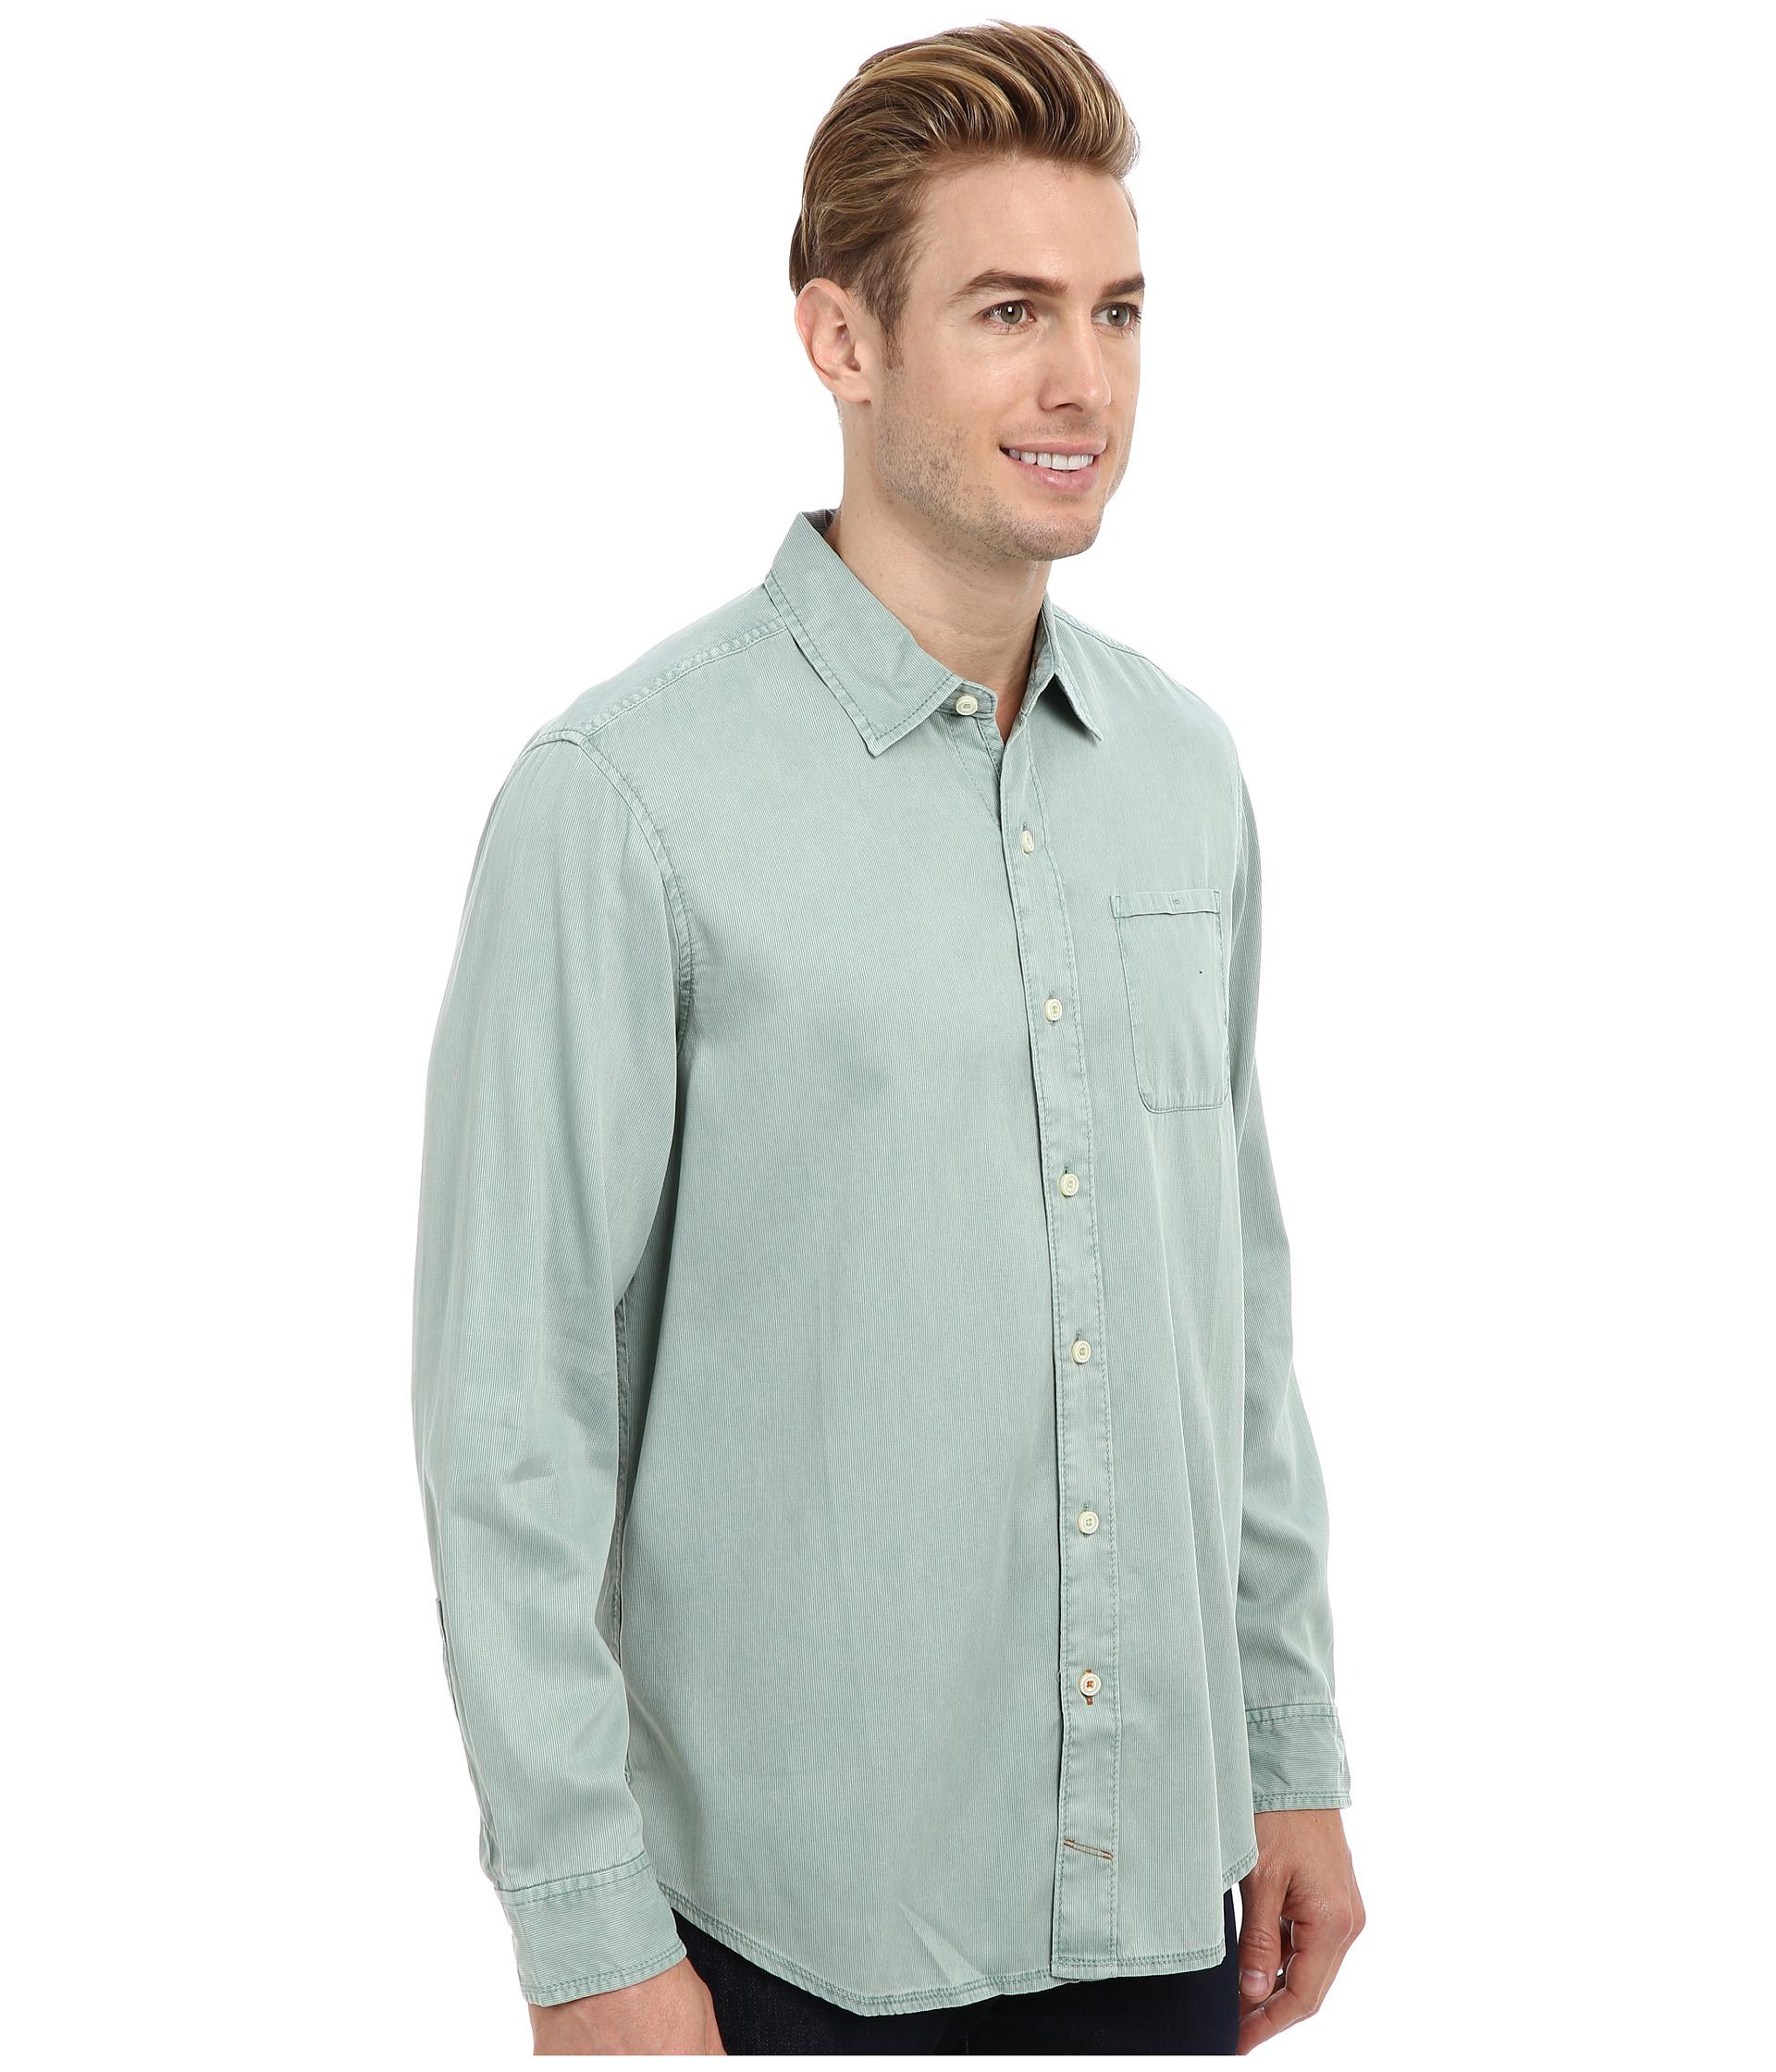 Tommy bahama island modern fit coastline cruiser ls shirt for Tommy bahama christmas shirt 2014